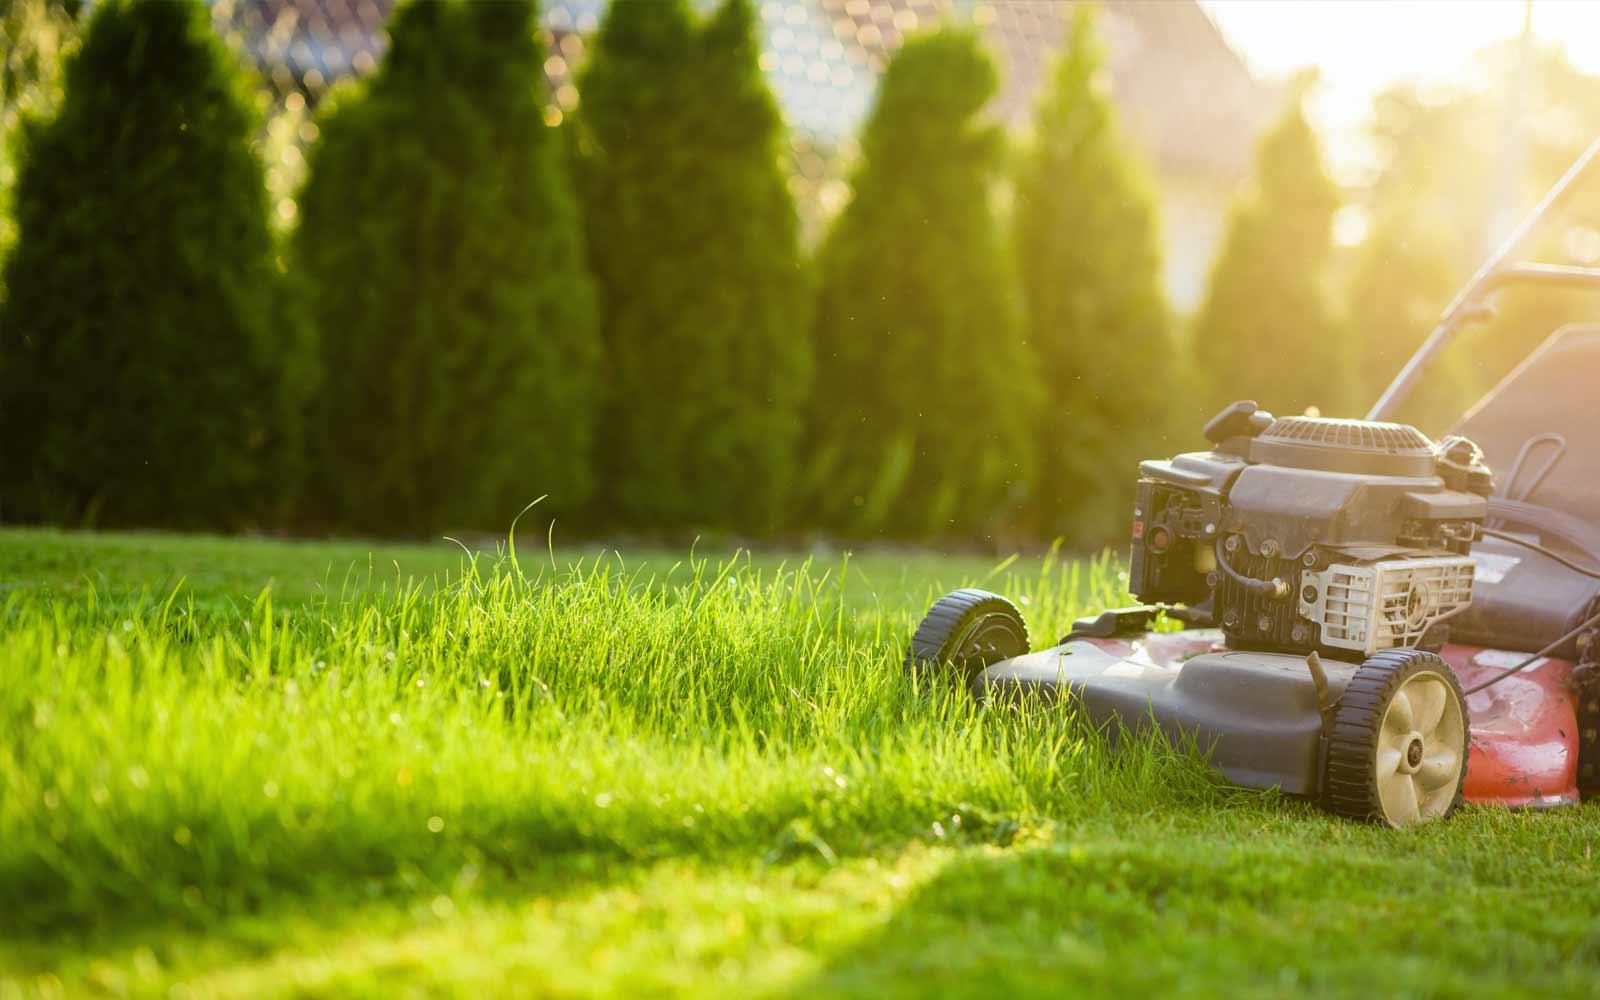 Lawnmowers & Quads